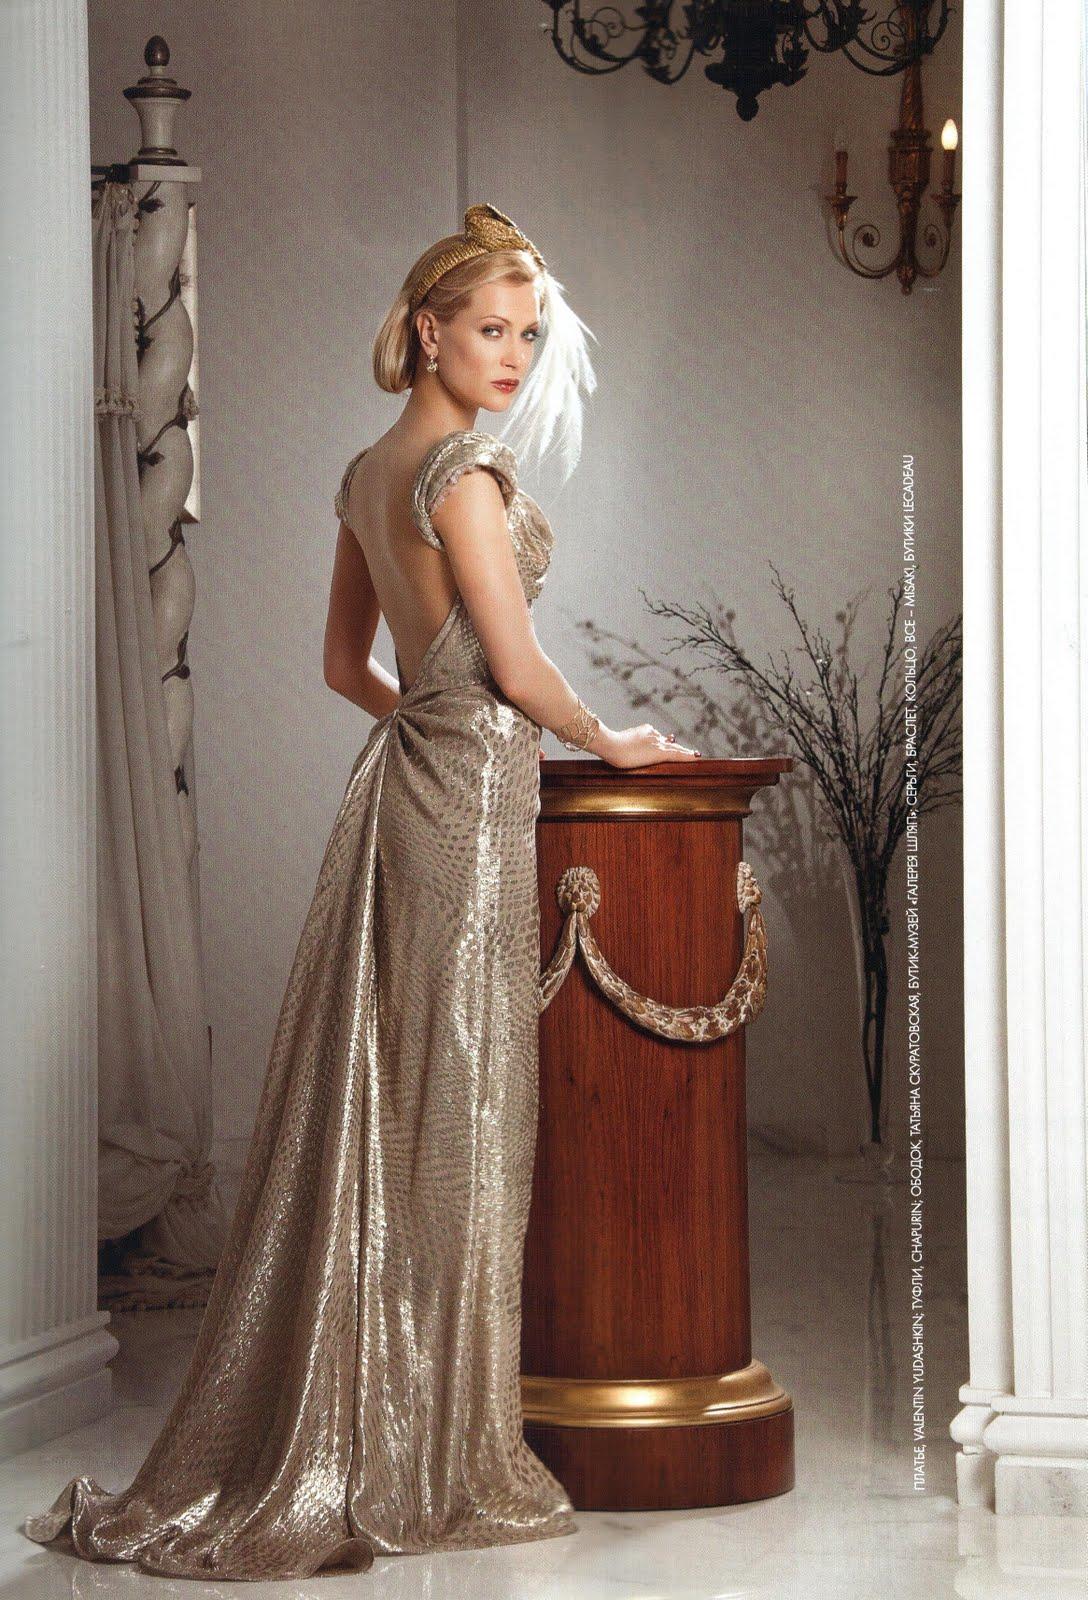 Юлия зимина фото в журнале 28 фотография